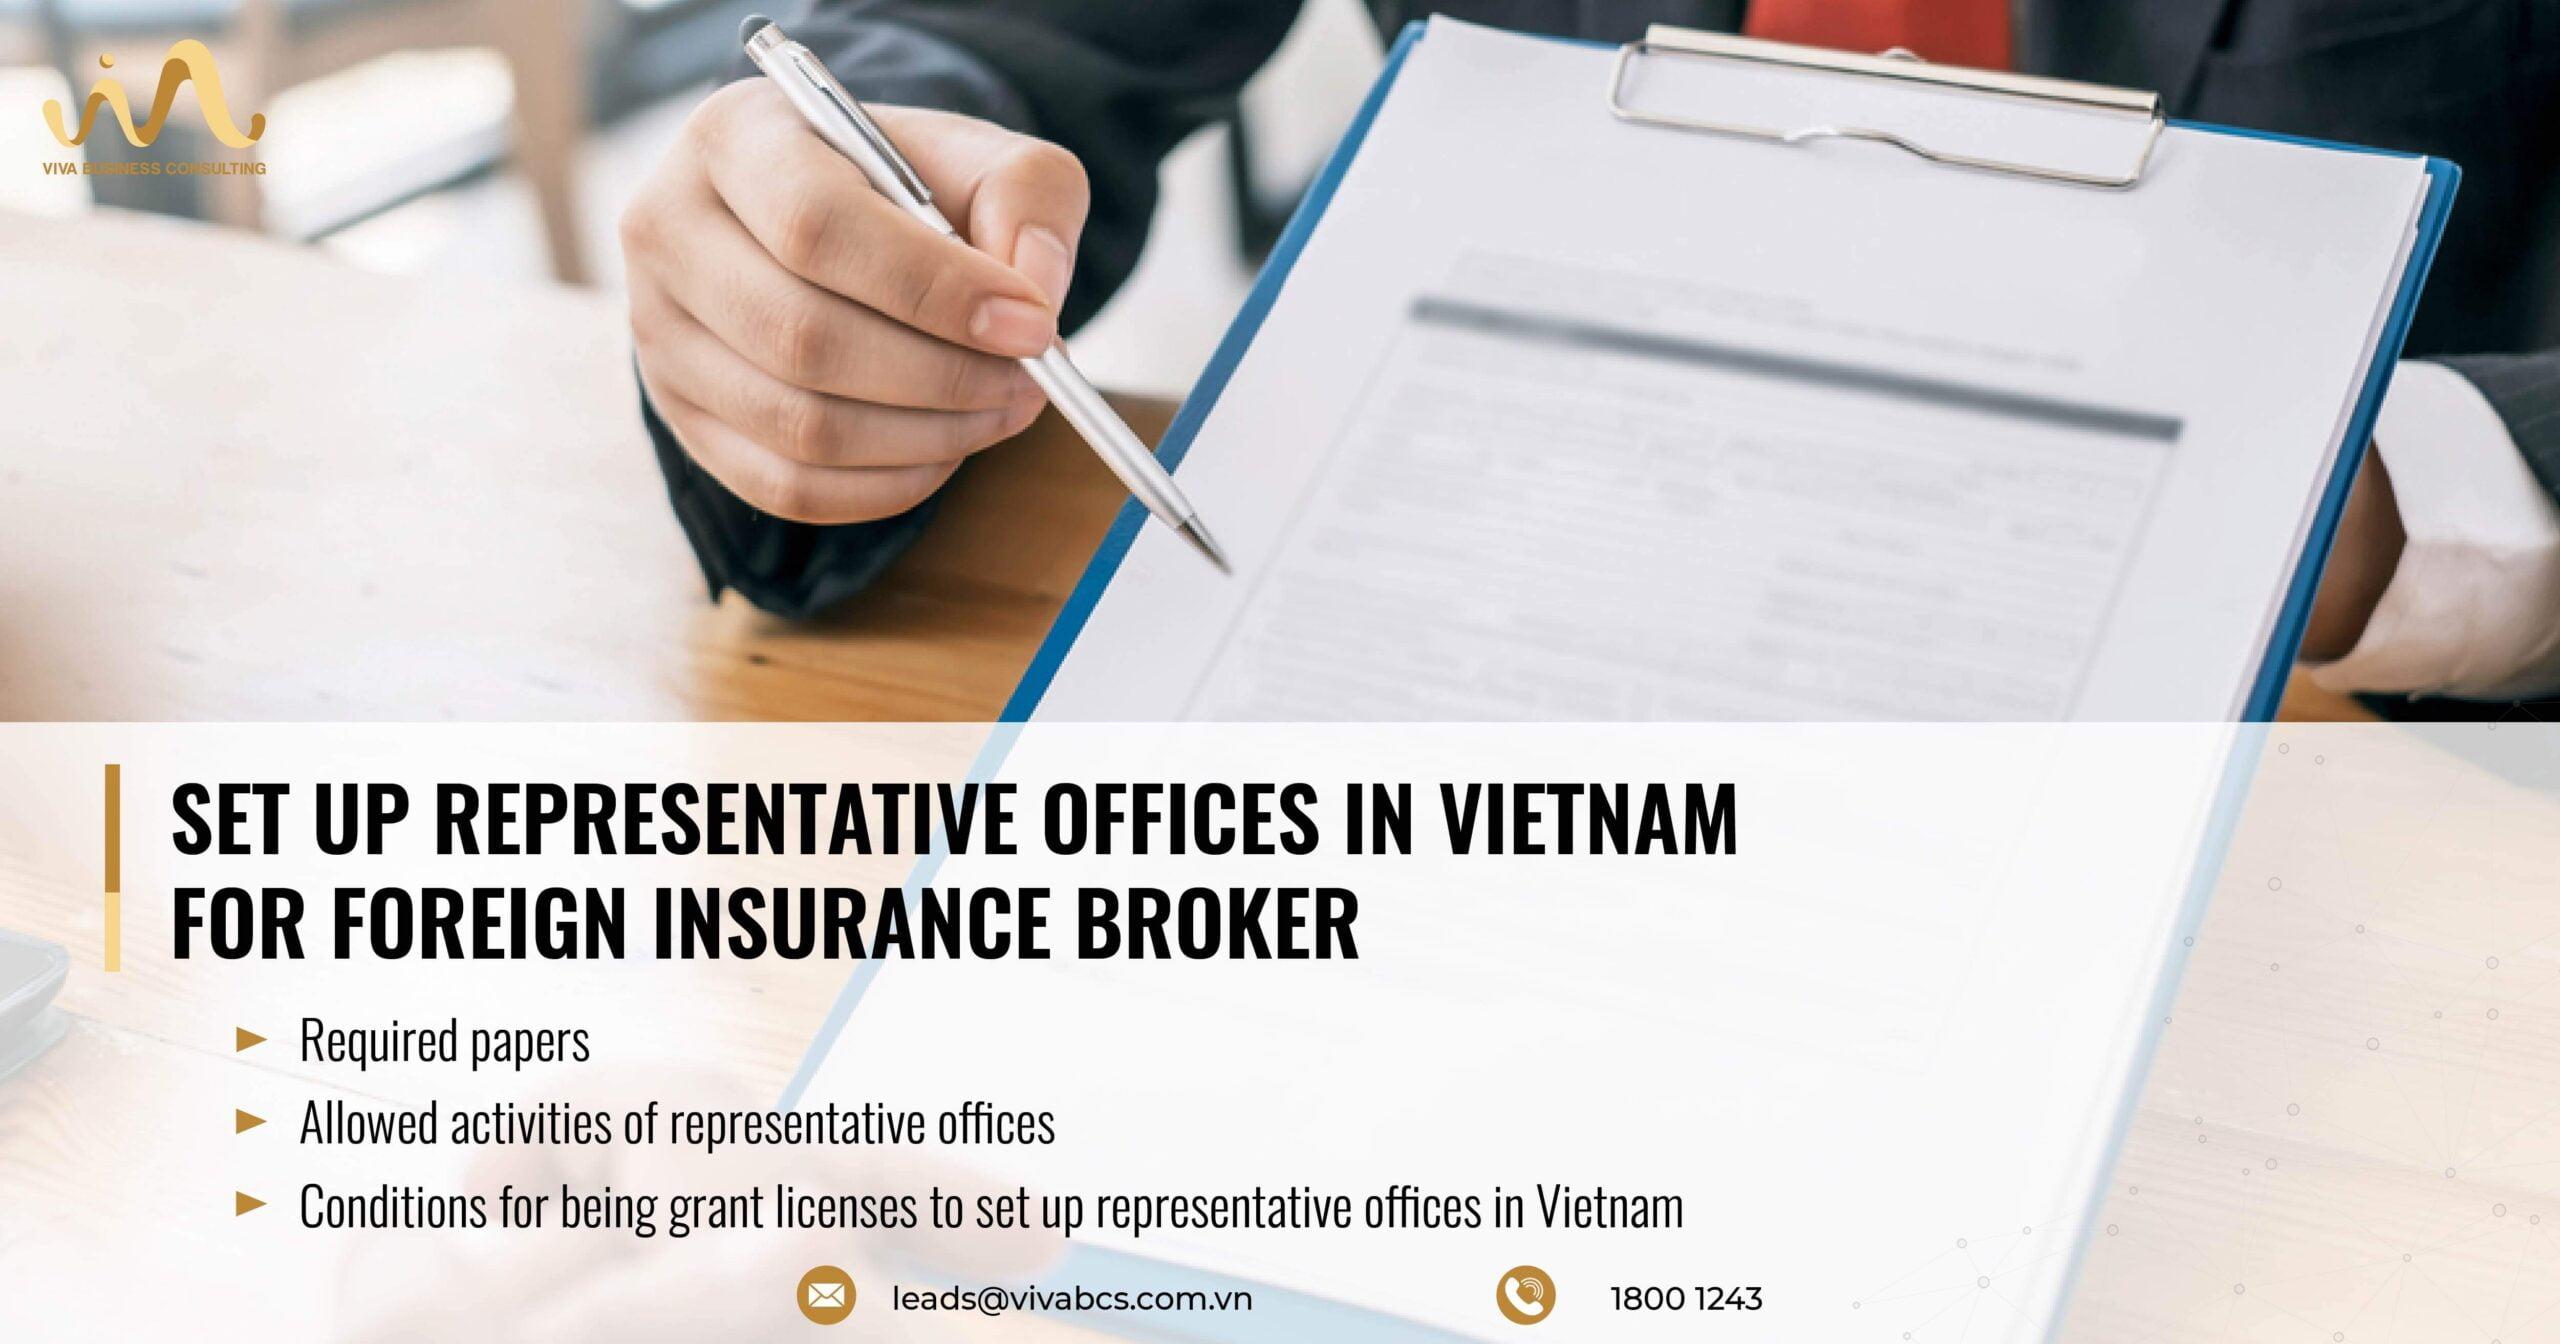 Representative offices in Vietnam: Foreign Insurance Brokerage